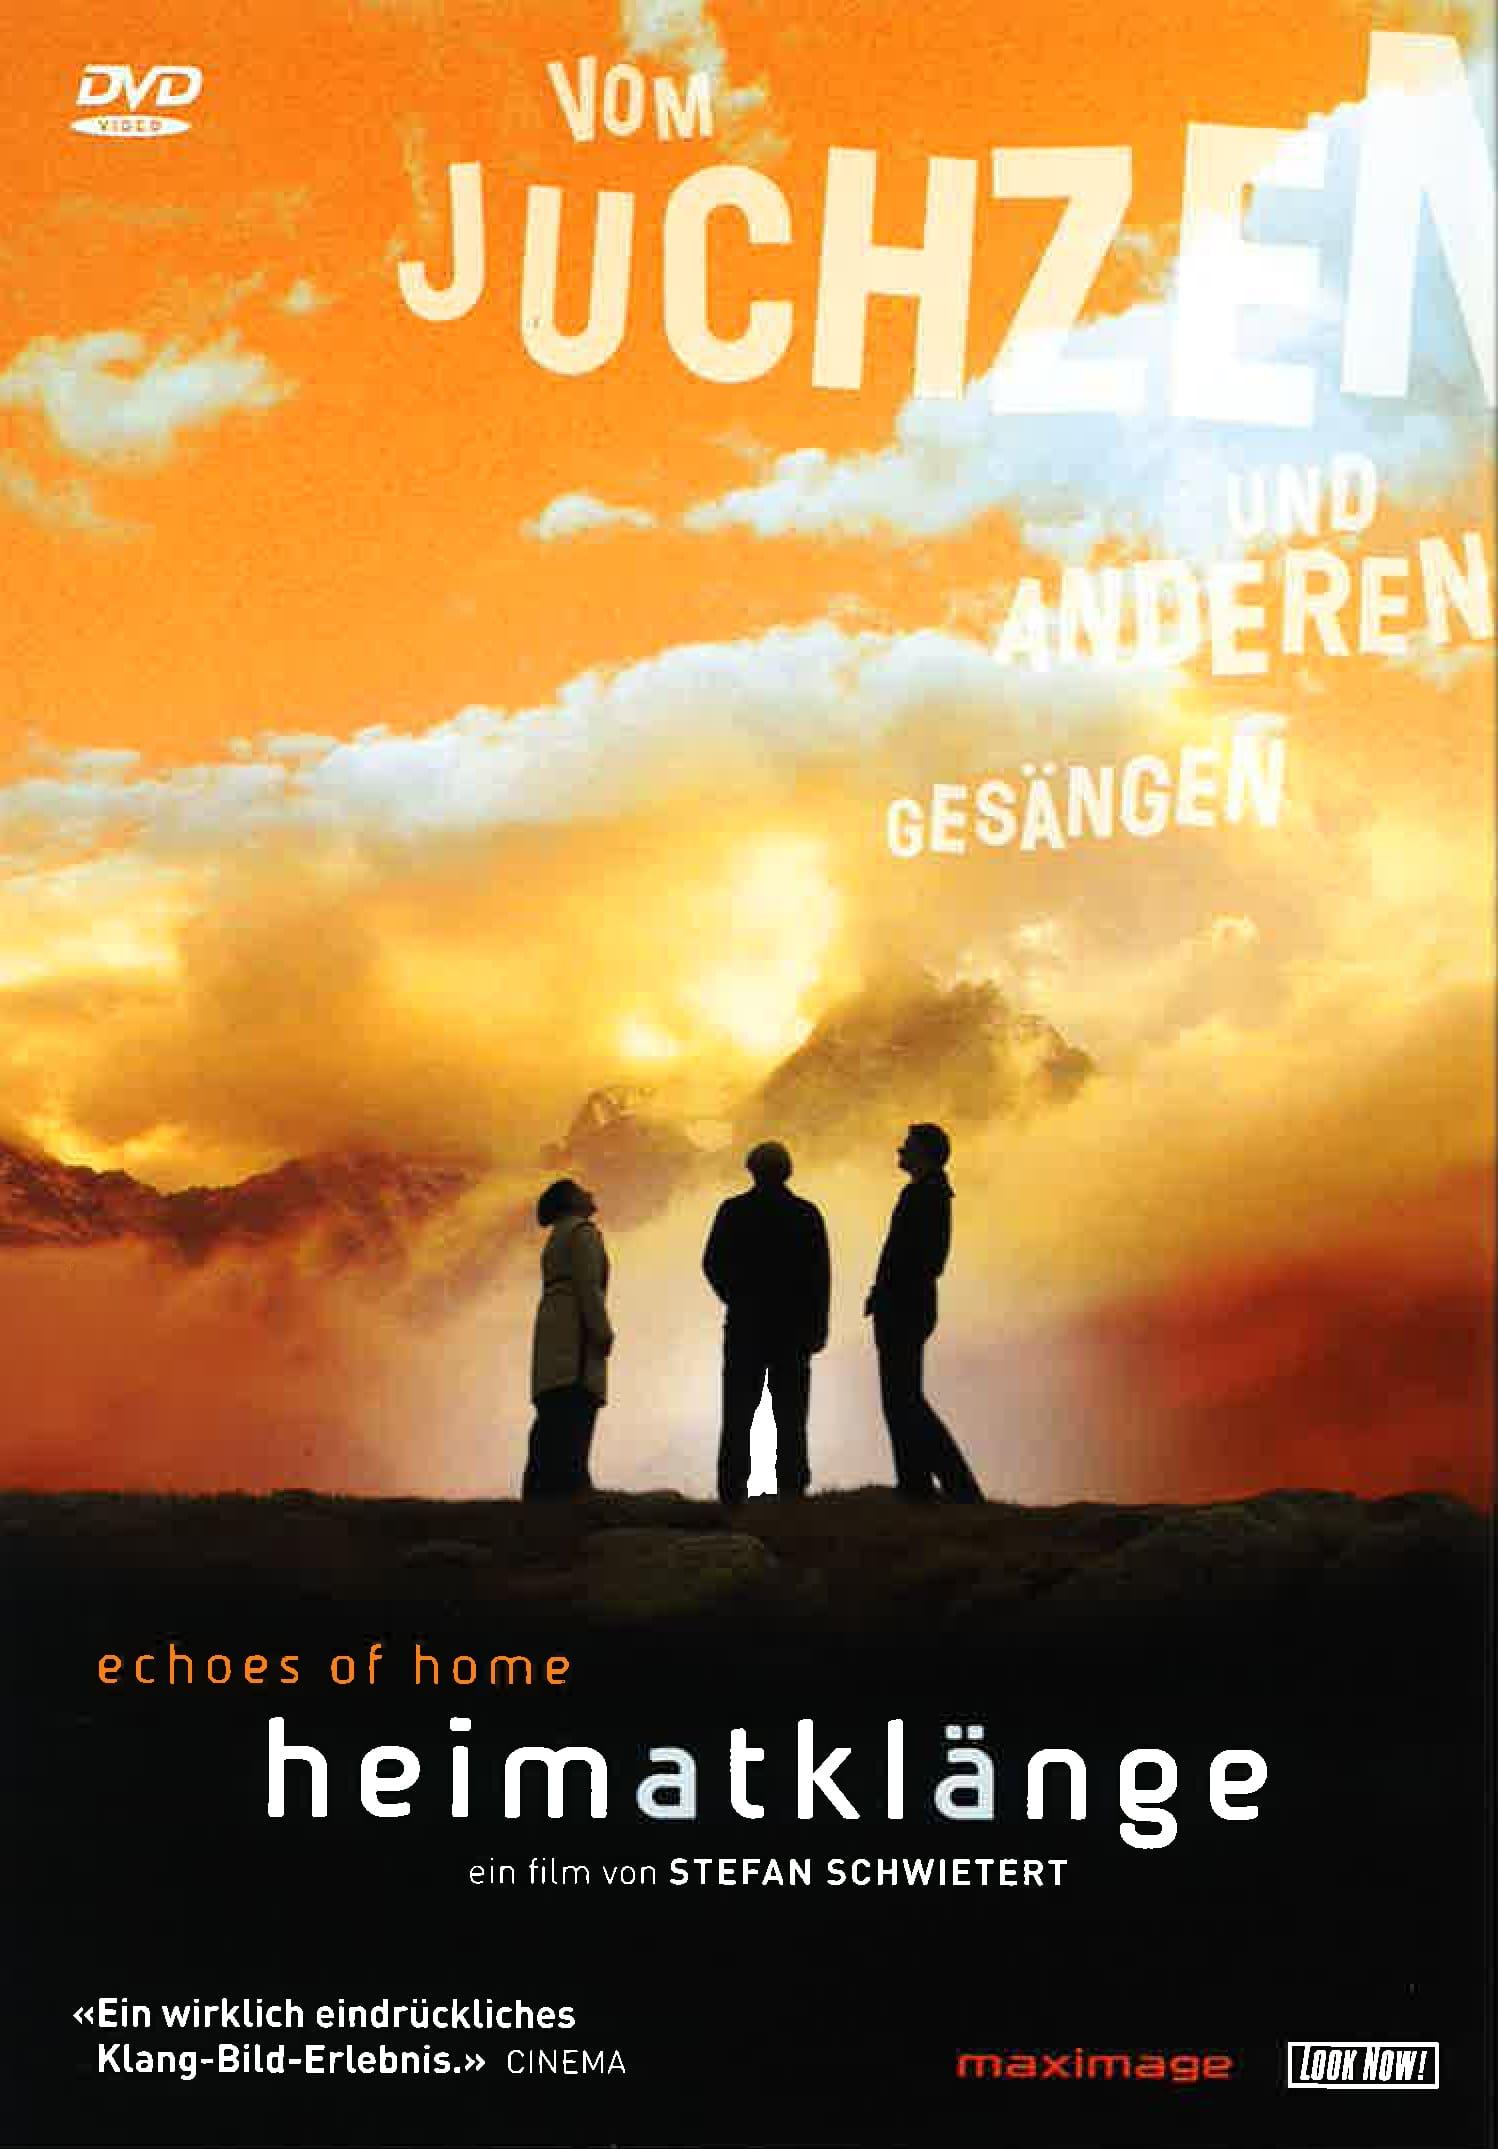 Heimatklänge (2007)